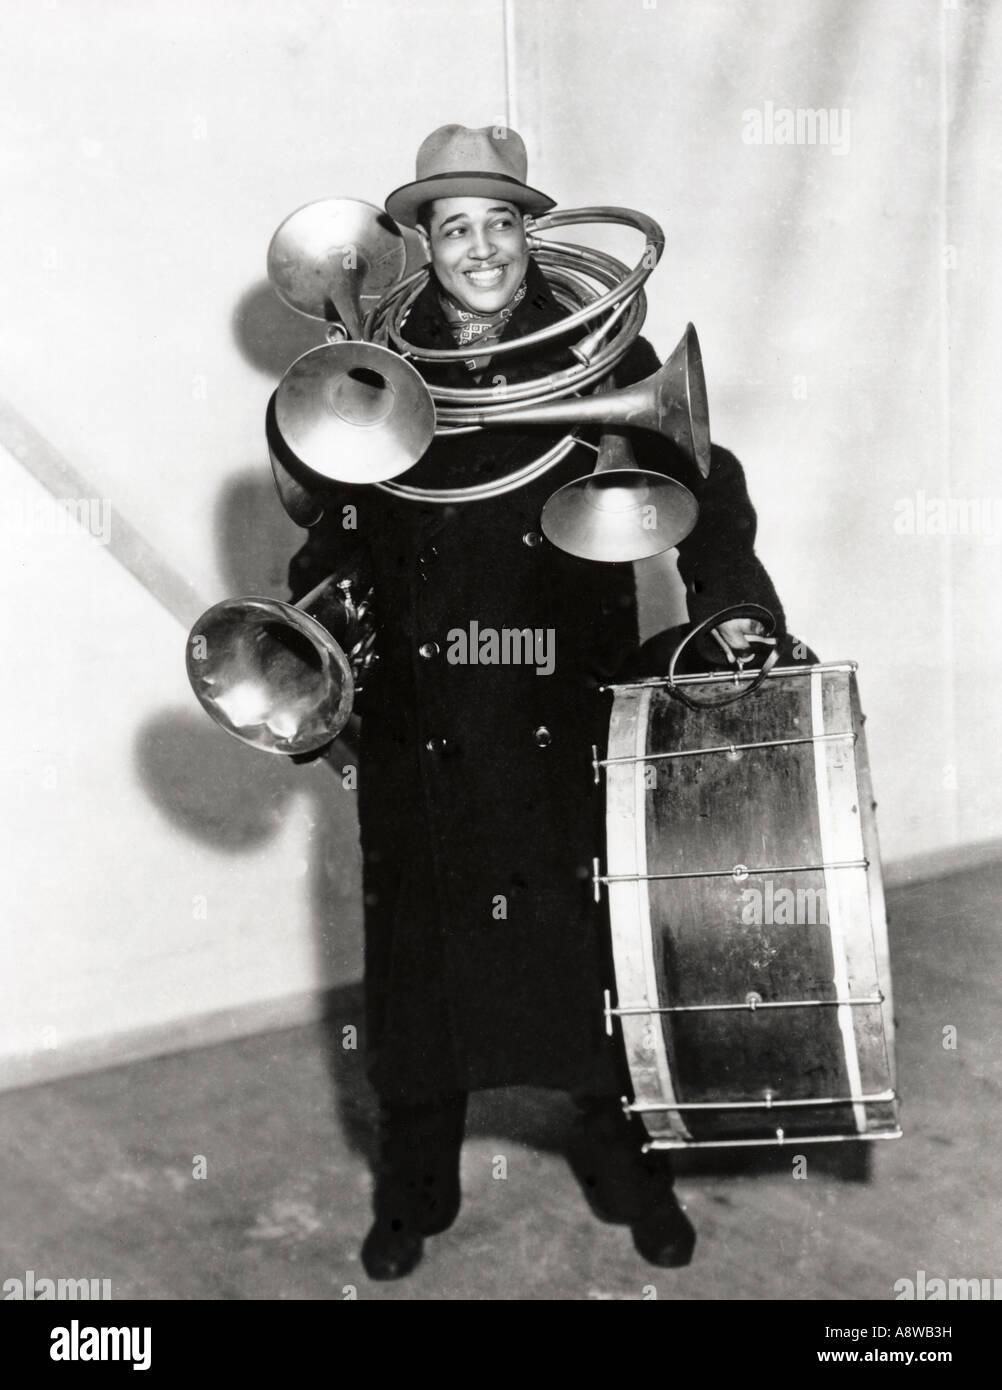 DUKE ELLINGTON - US jazz musician - Stock Image